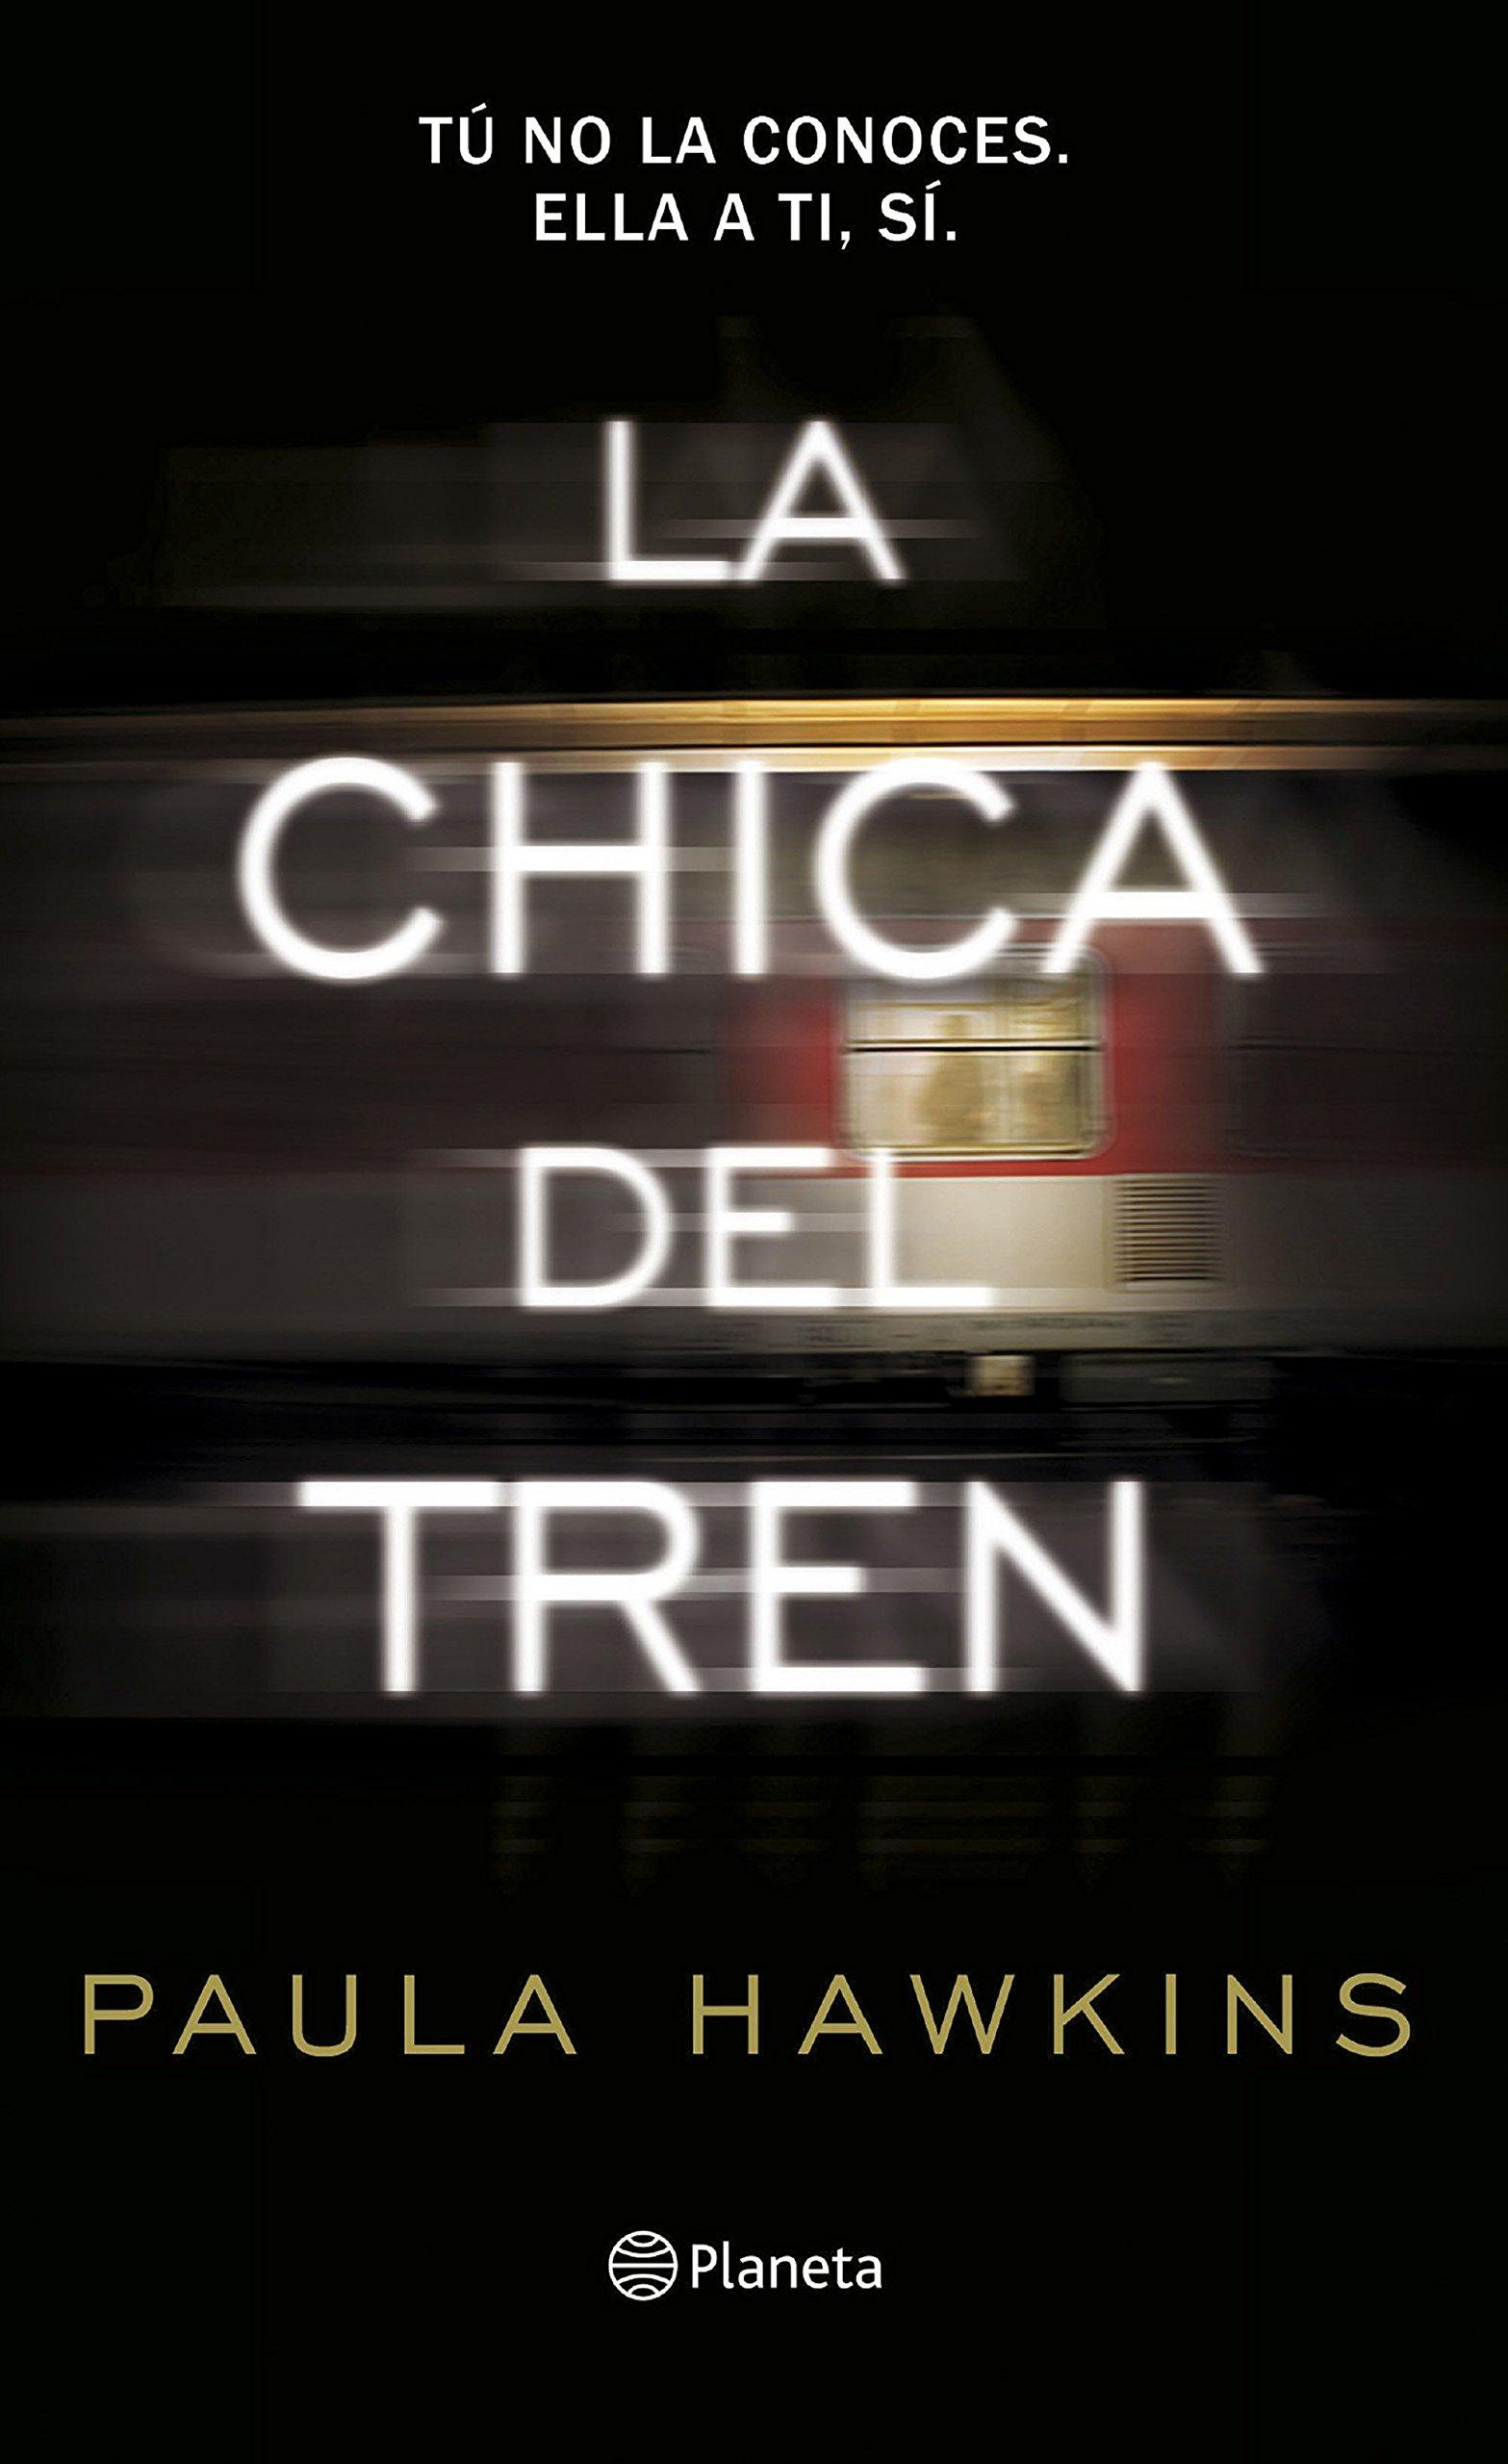 Portada libro - La chica del tren